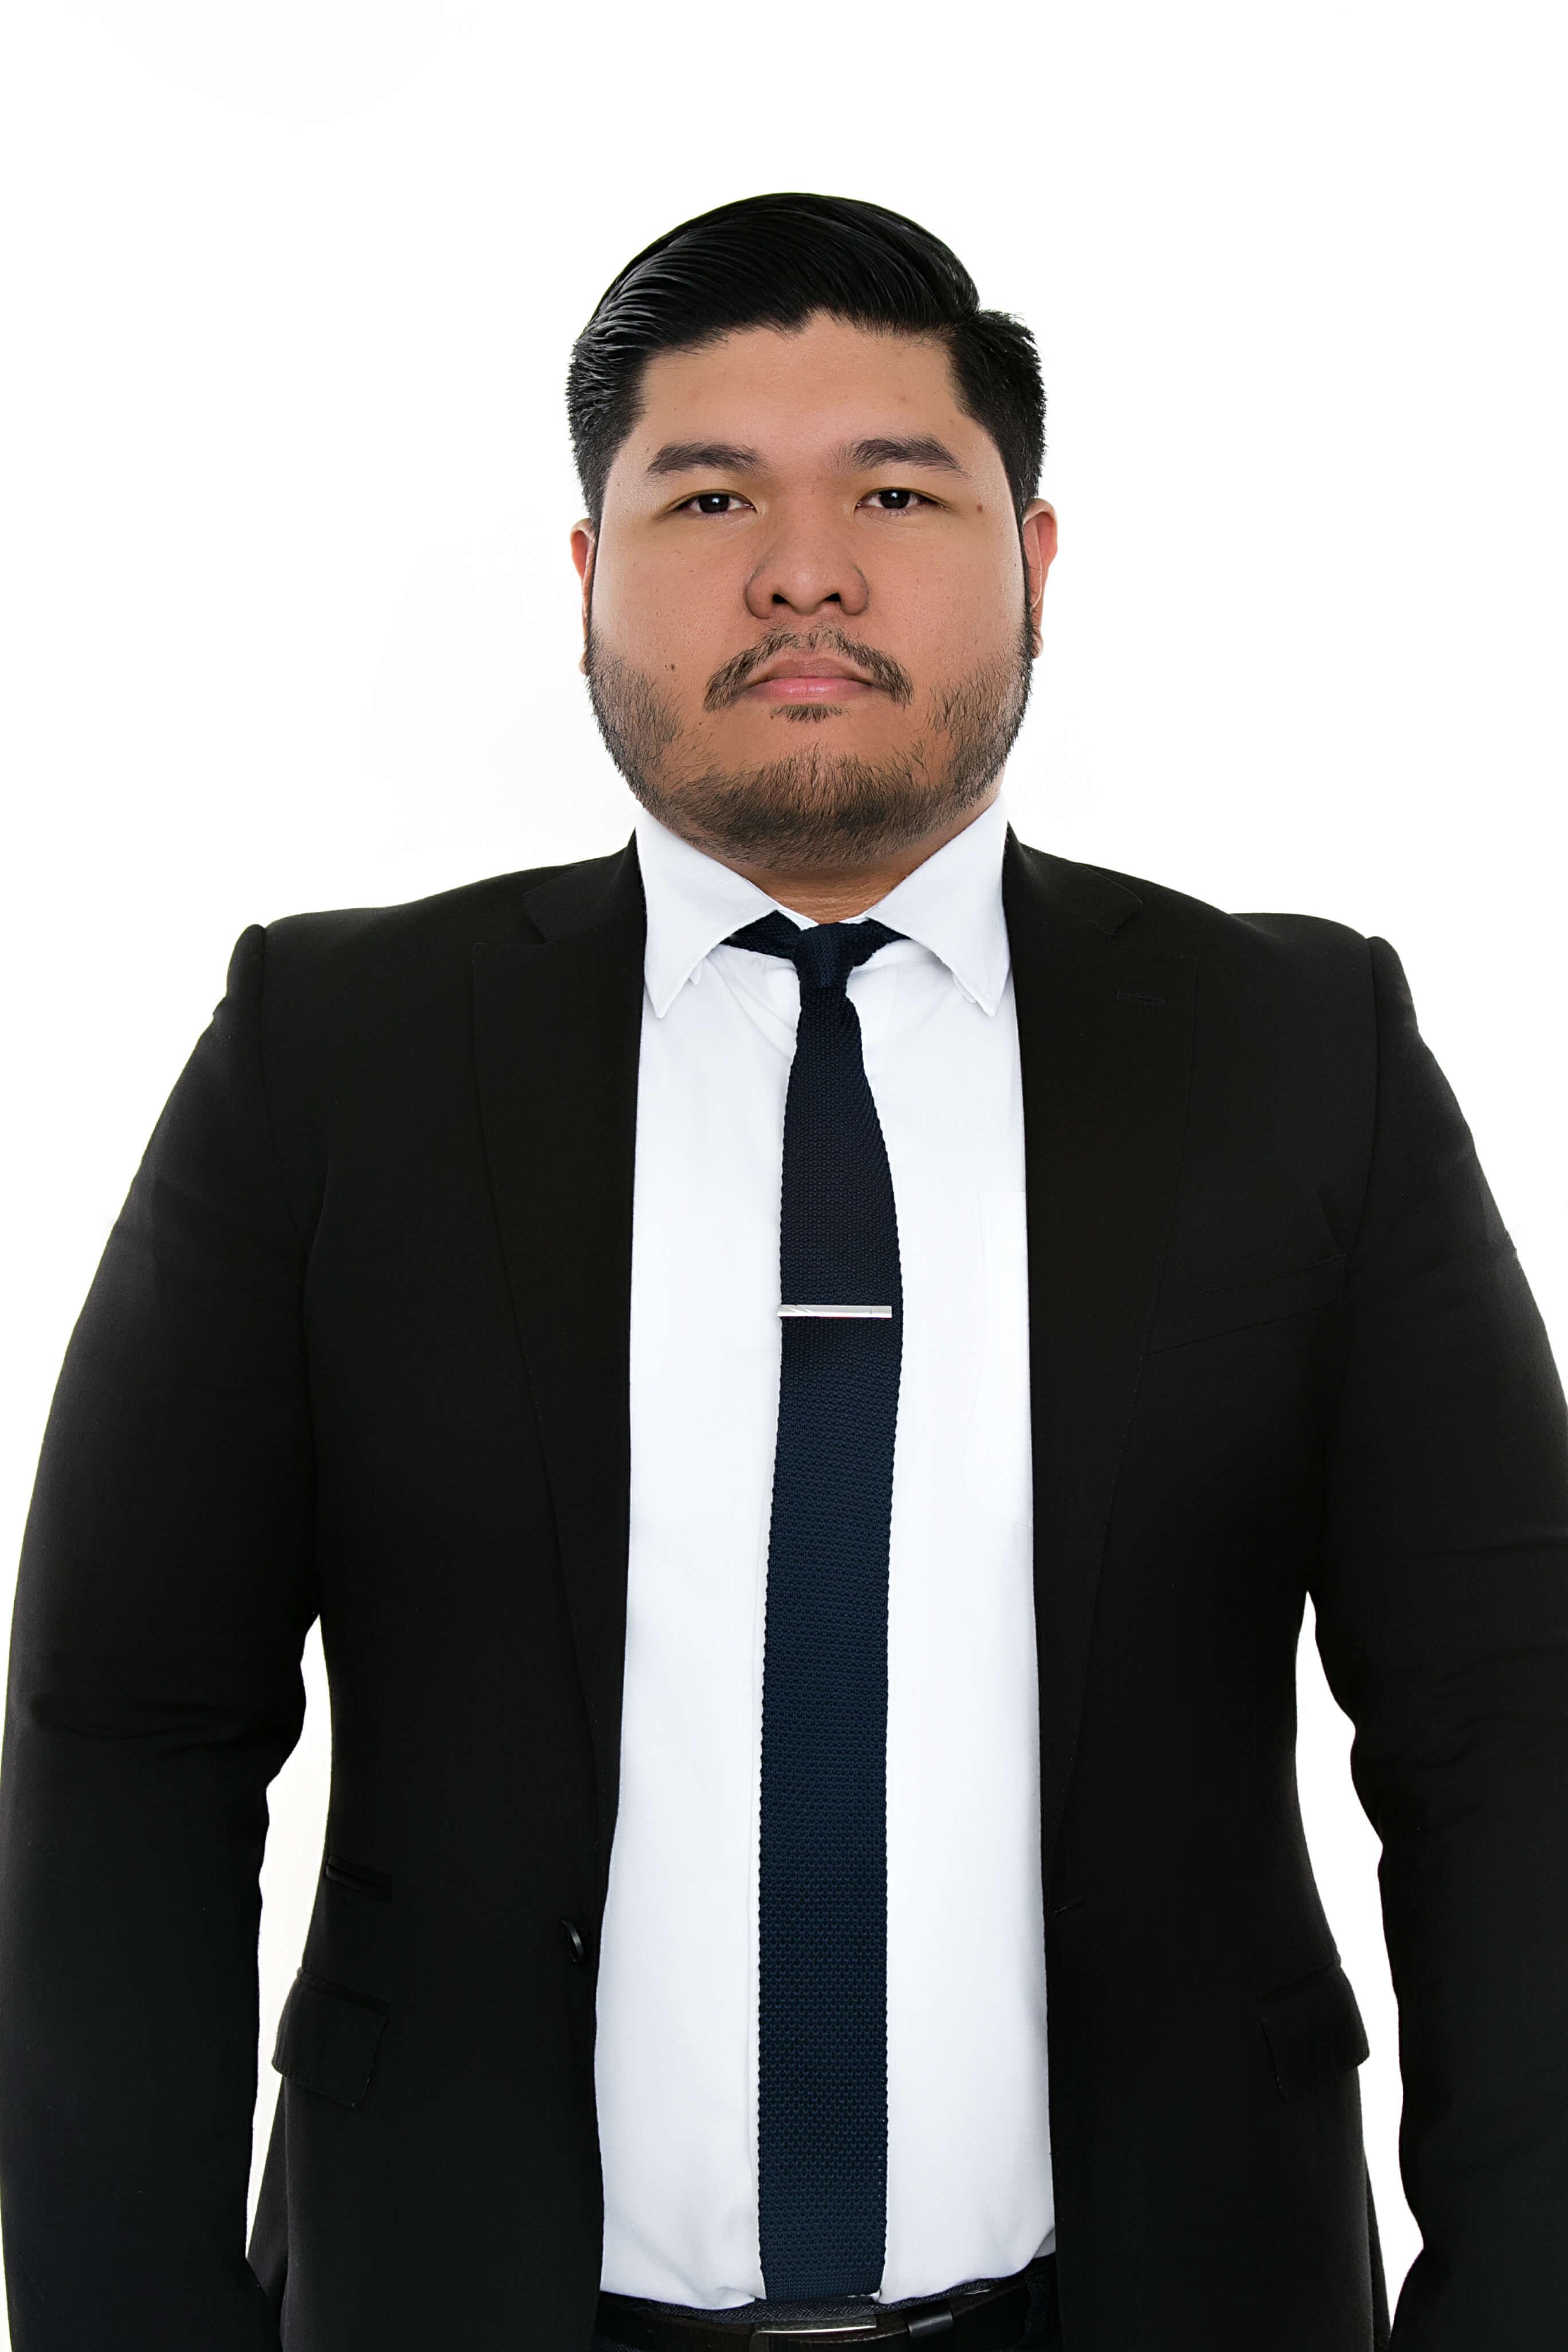 Gelacio C. Rivera IV